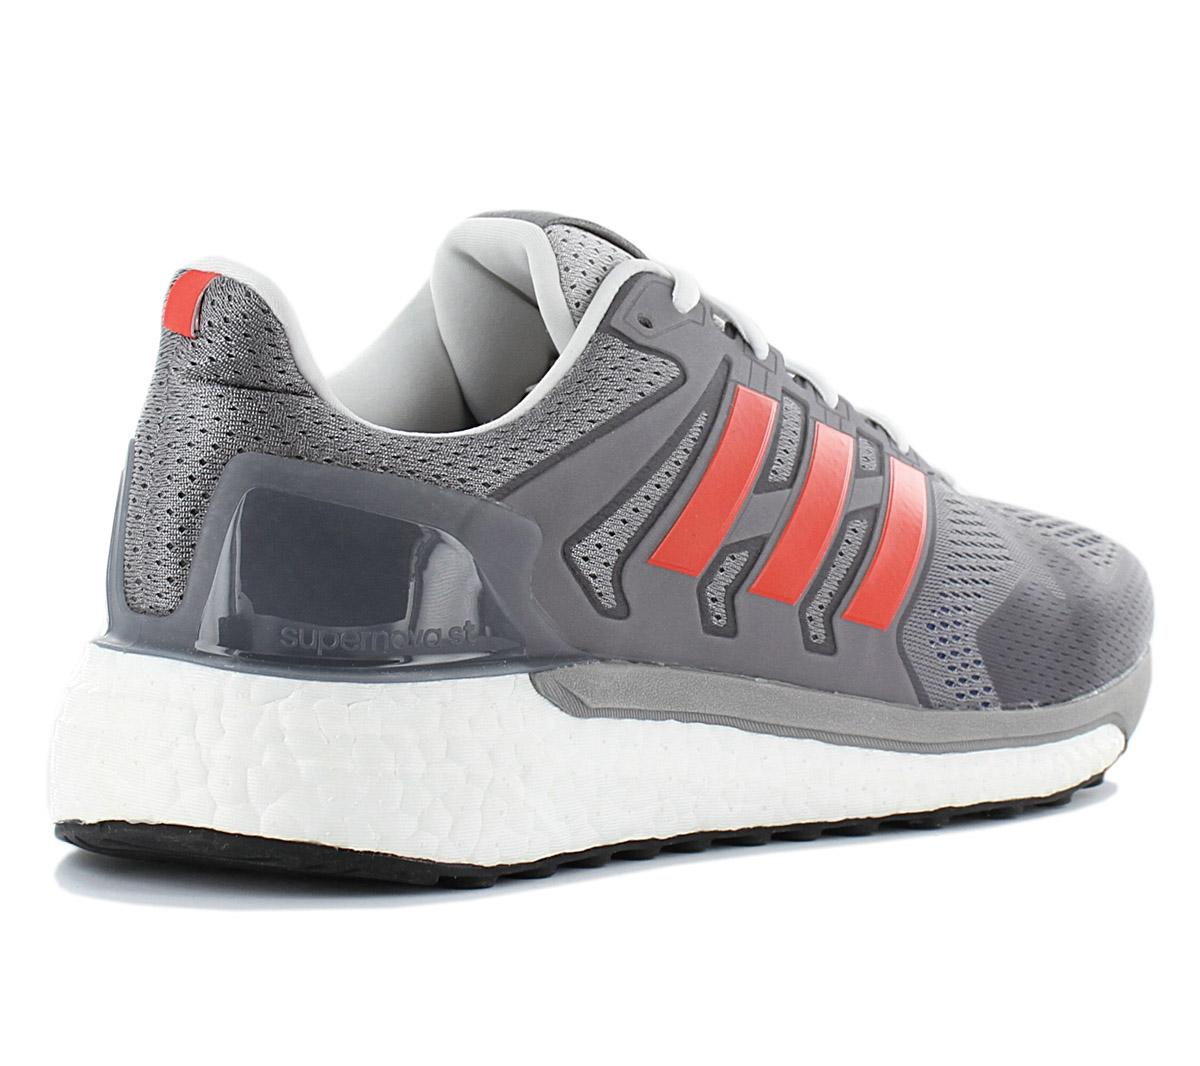 Details about Adidas Supernova ST Active Boost Mens Running Shoes DA9658 Running Sport Shoe NEW show original title